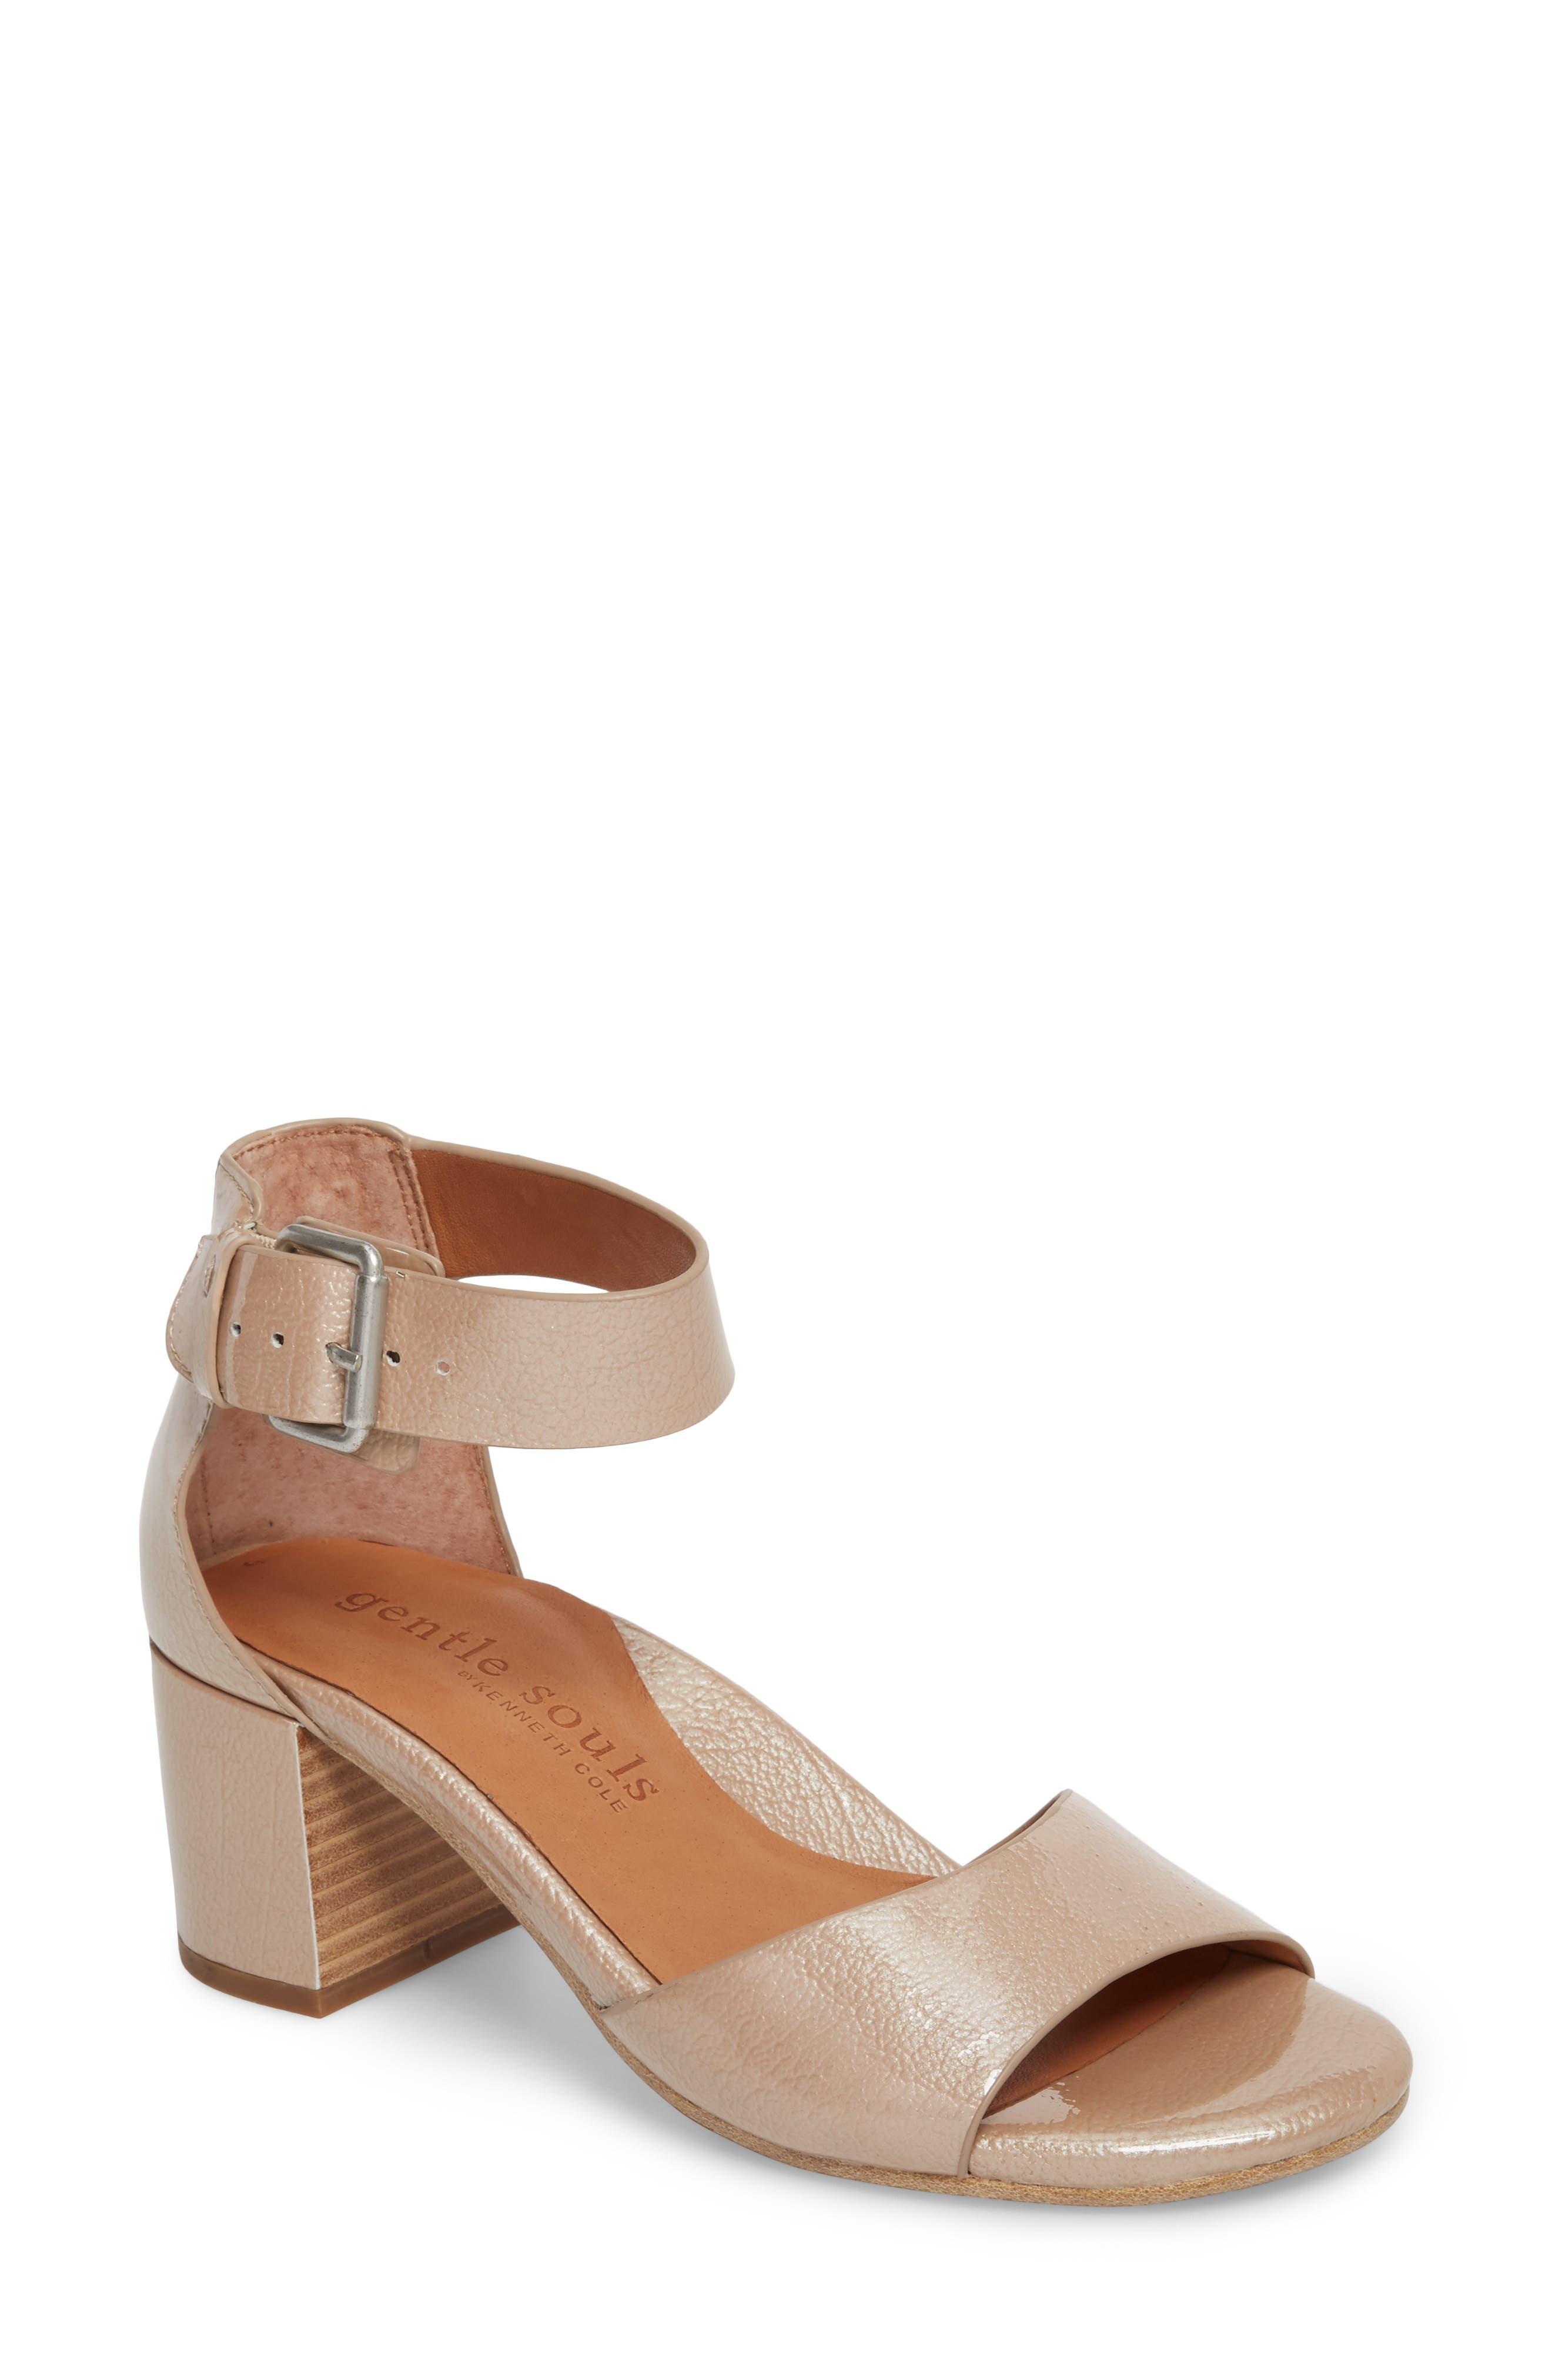 Christa Block Heel Sandal,                             Main thumbnail 1, color,                             NUDE PATENT LEATHER